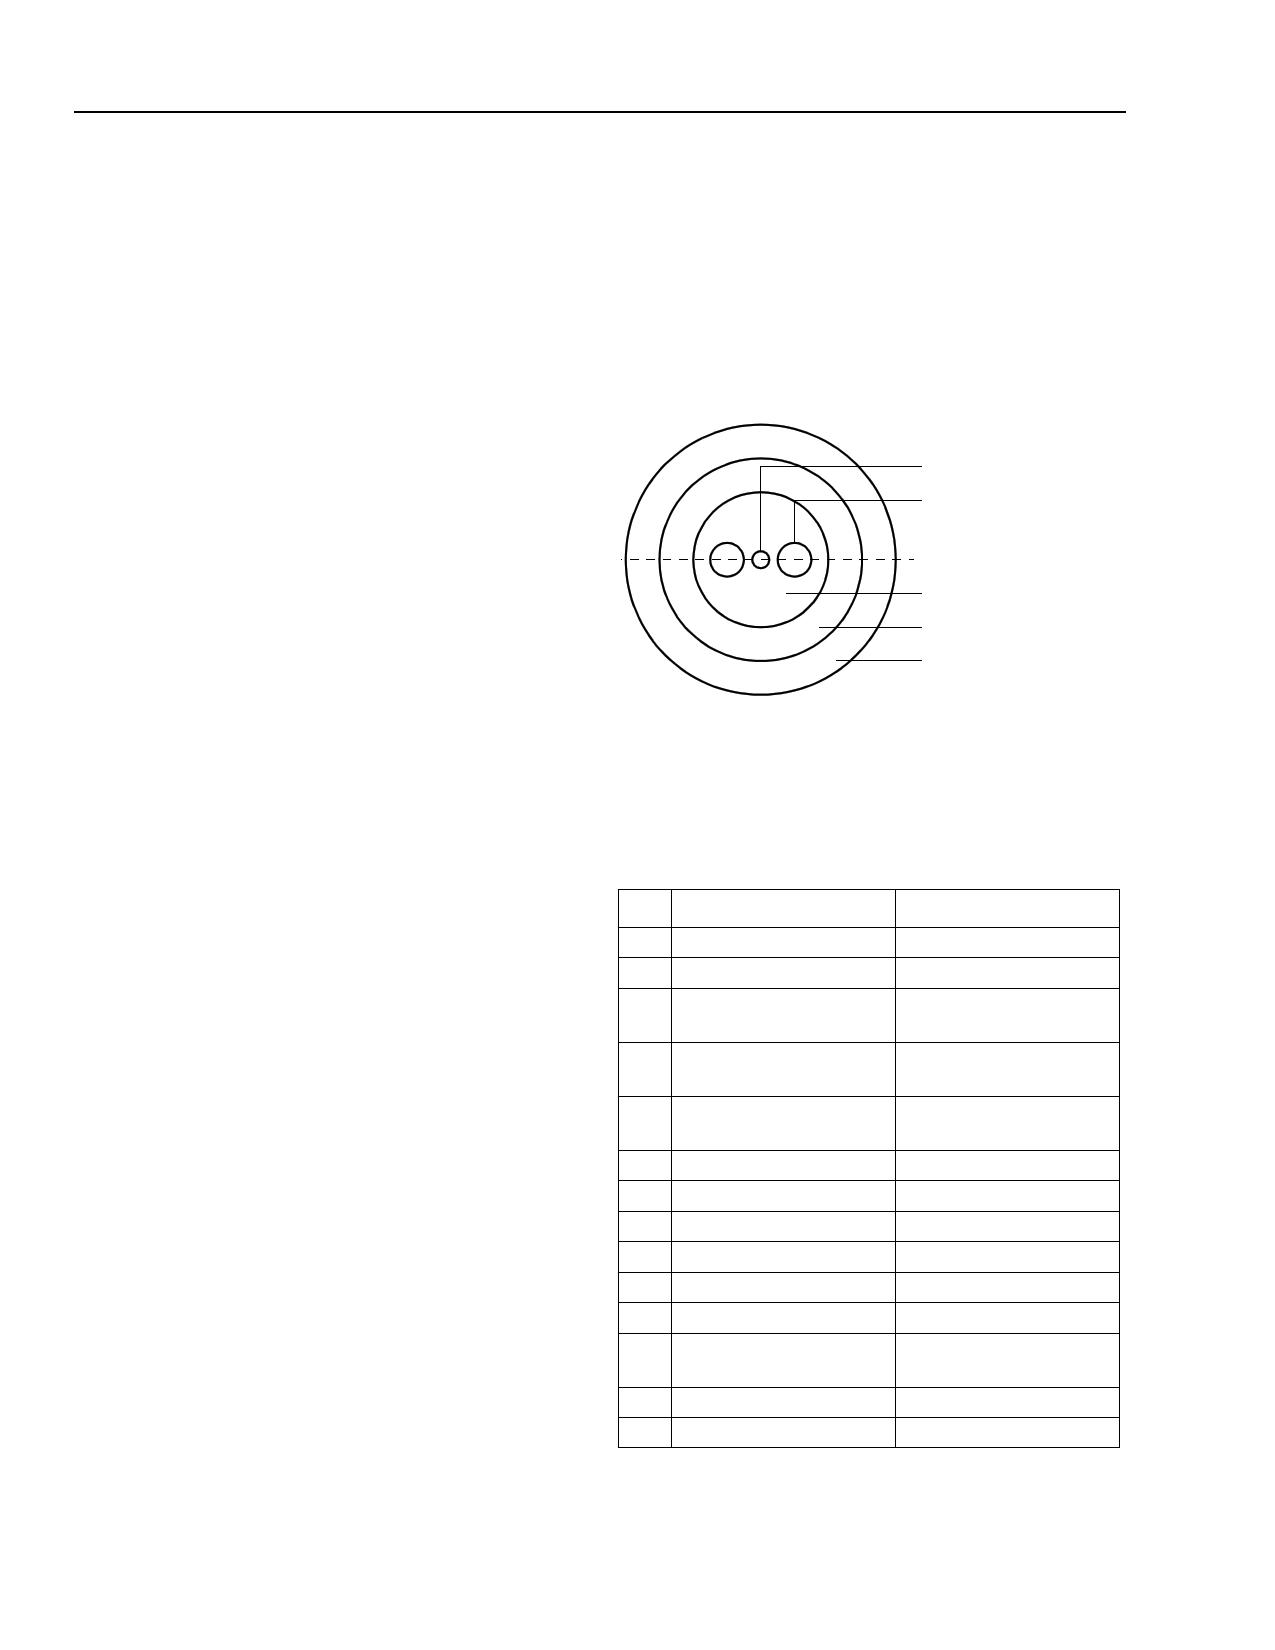 D2587P877 pdf, schematic